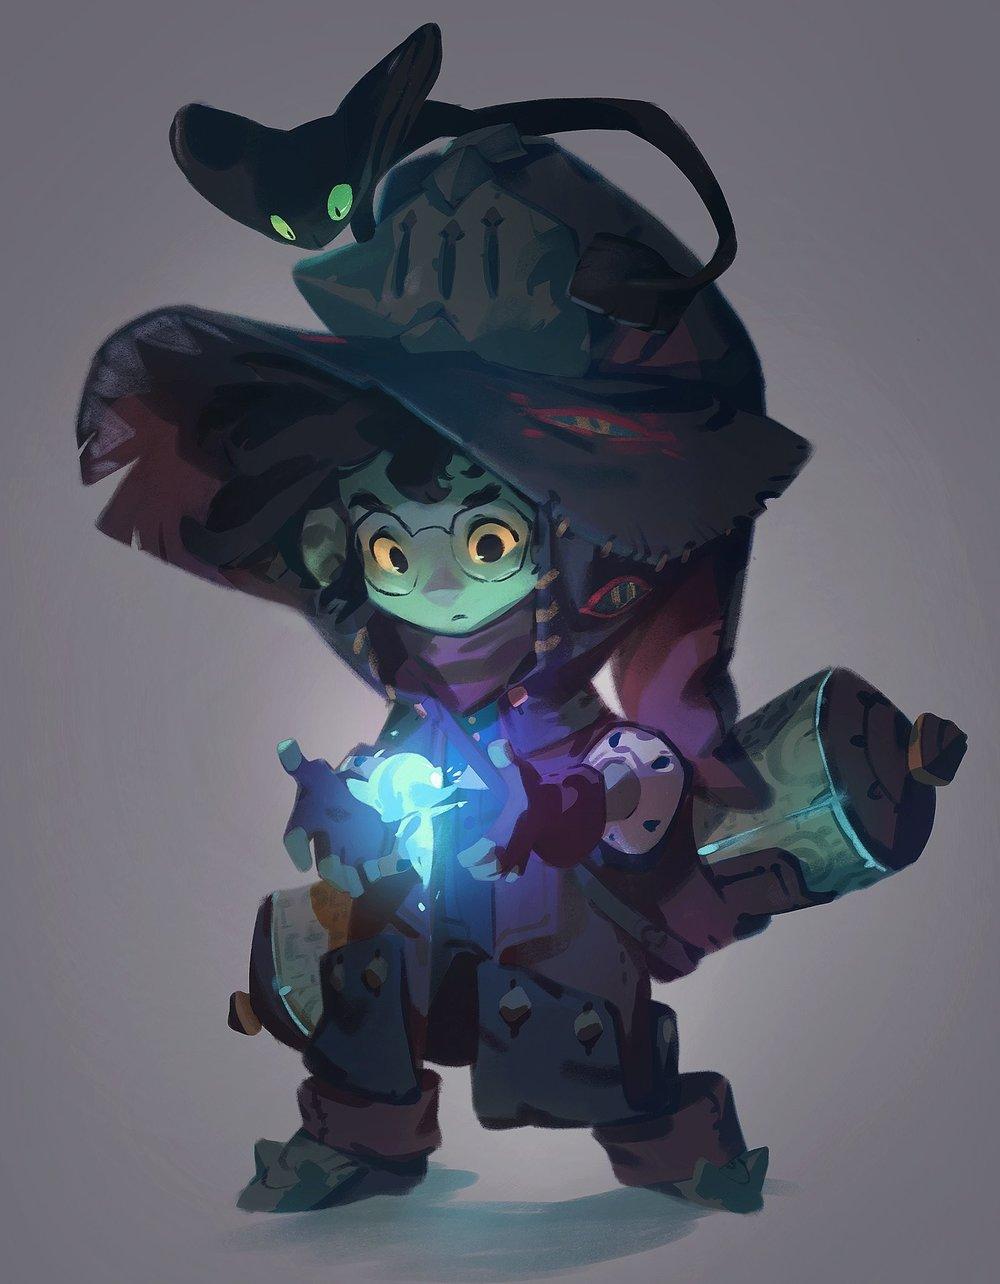 nicholas-kole-little-wizard-by-nicholaskole-da37tf3.jpg